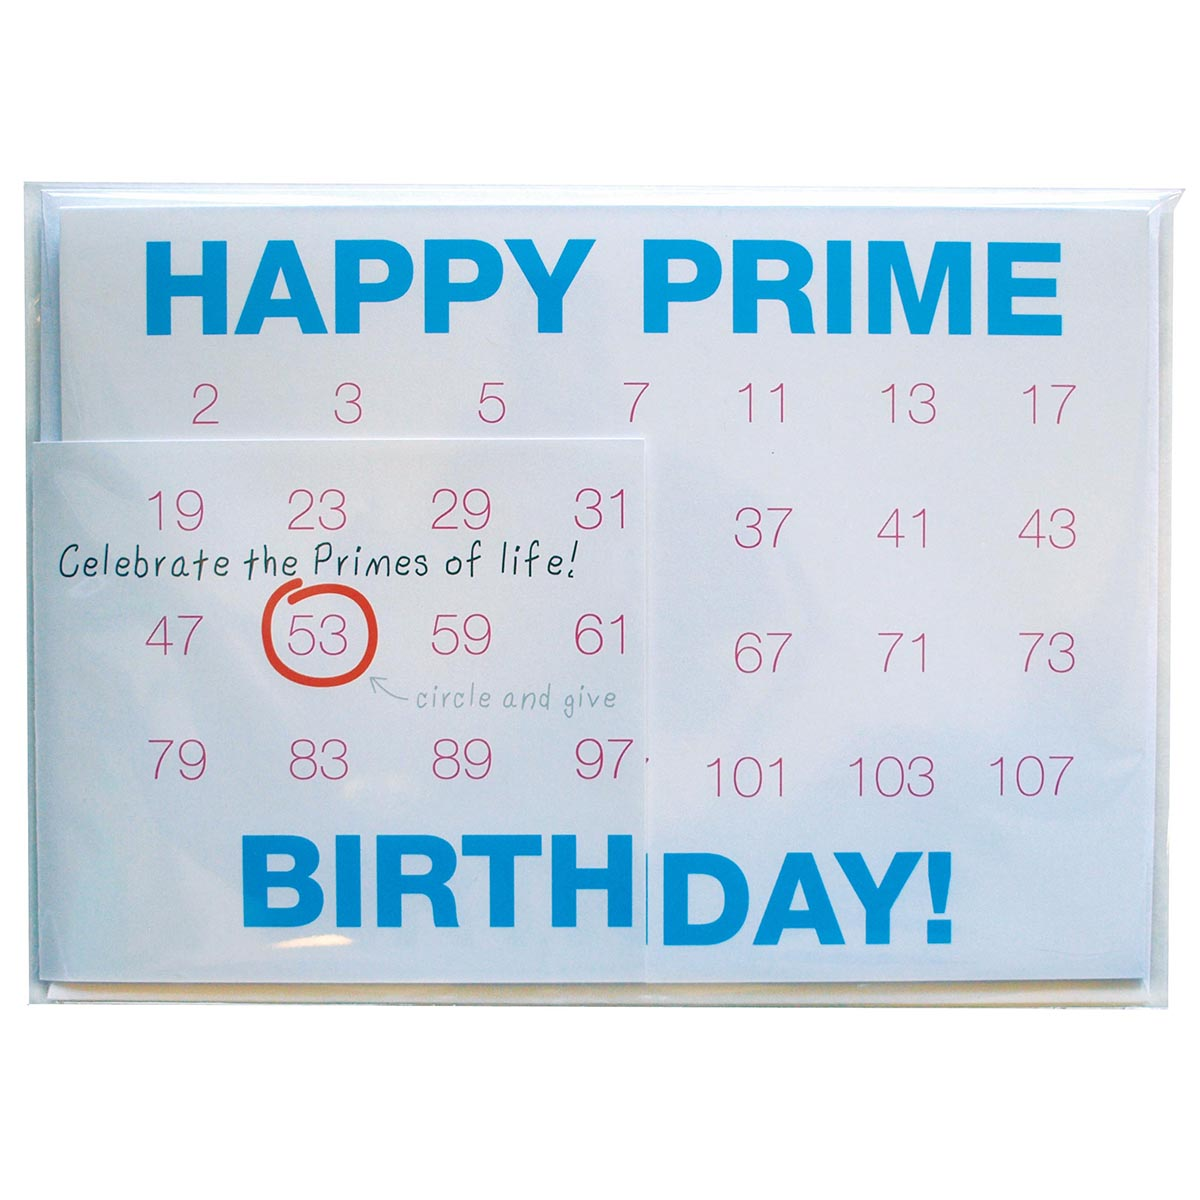 Happy prime birthday card w64089 copernicus toys gifts happy prime birthday card bookmarktalkfo Images